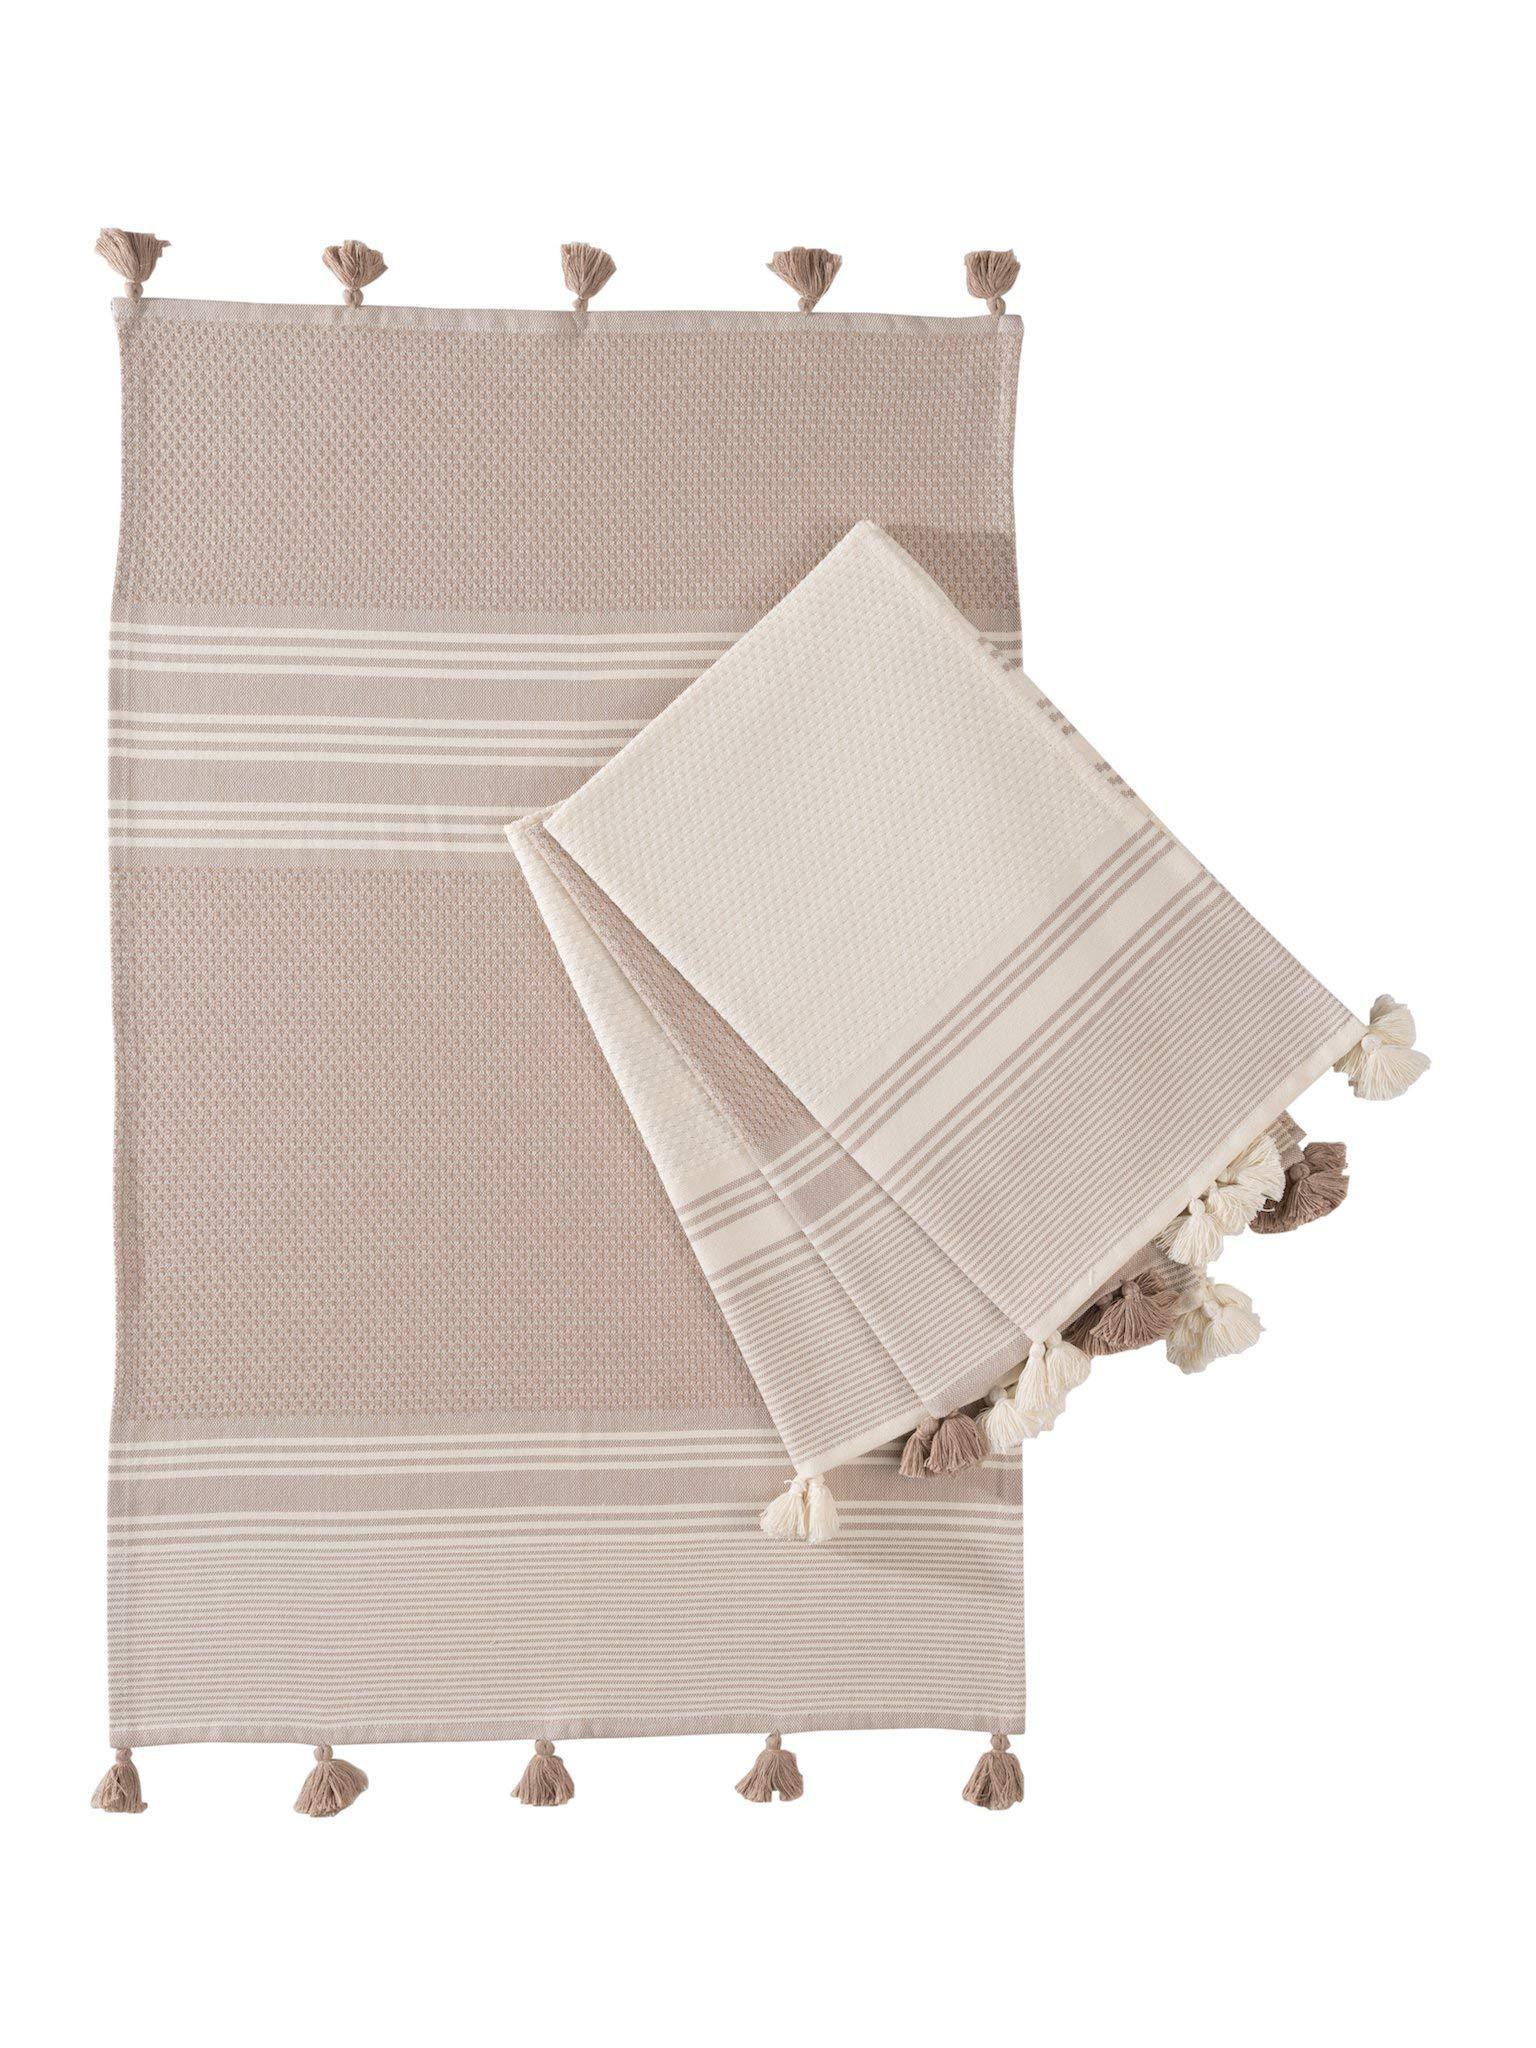 "Kuprum Turkish Cotton Hand Towels Set of 4 Decorative Striped Patterned Peshtemal Hammam Bath Kitchen Spa Pestemal Towels with Tassels Pom Pom (2 Beige, 2 Ivory Cream 20""x30"" Taupe Stone Neutral Sand)"